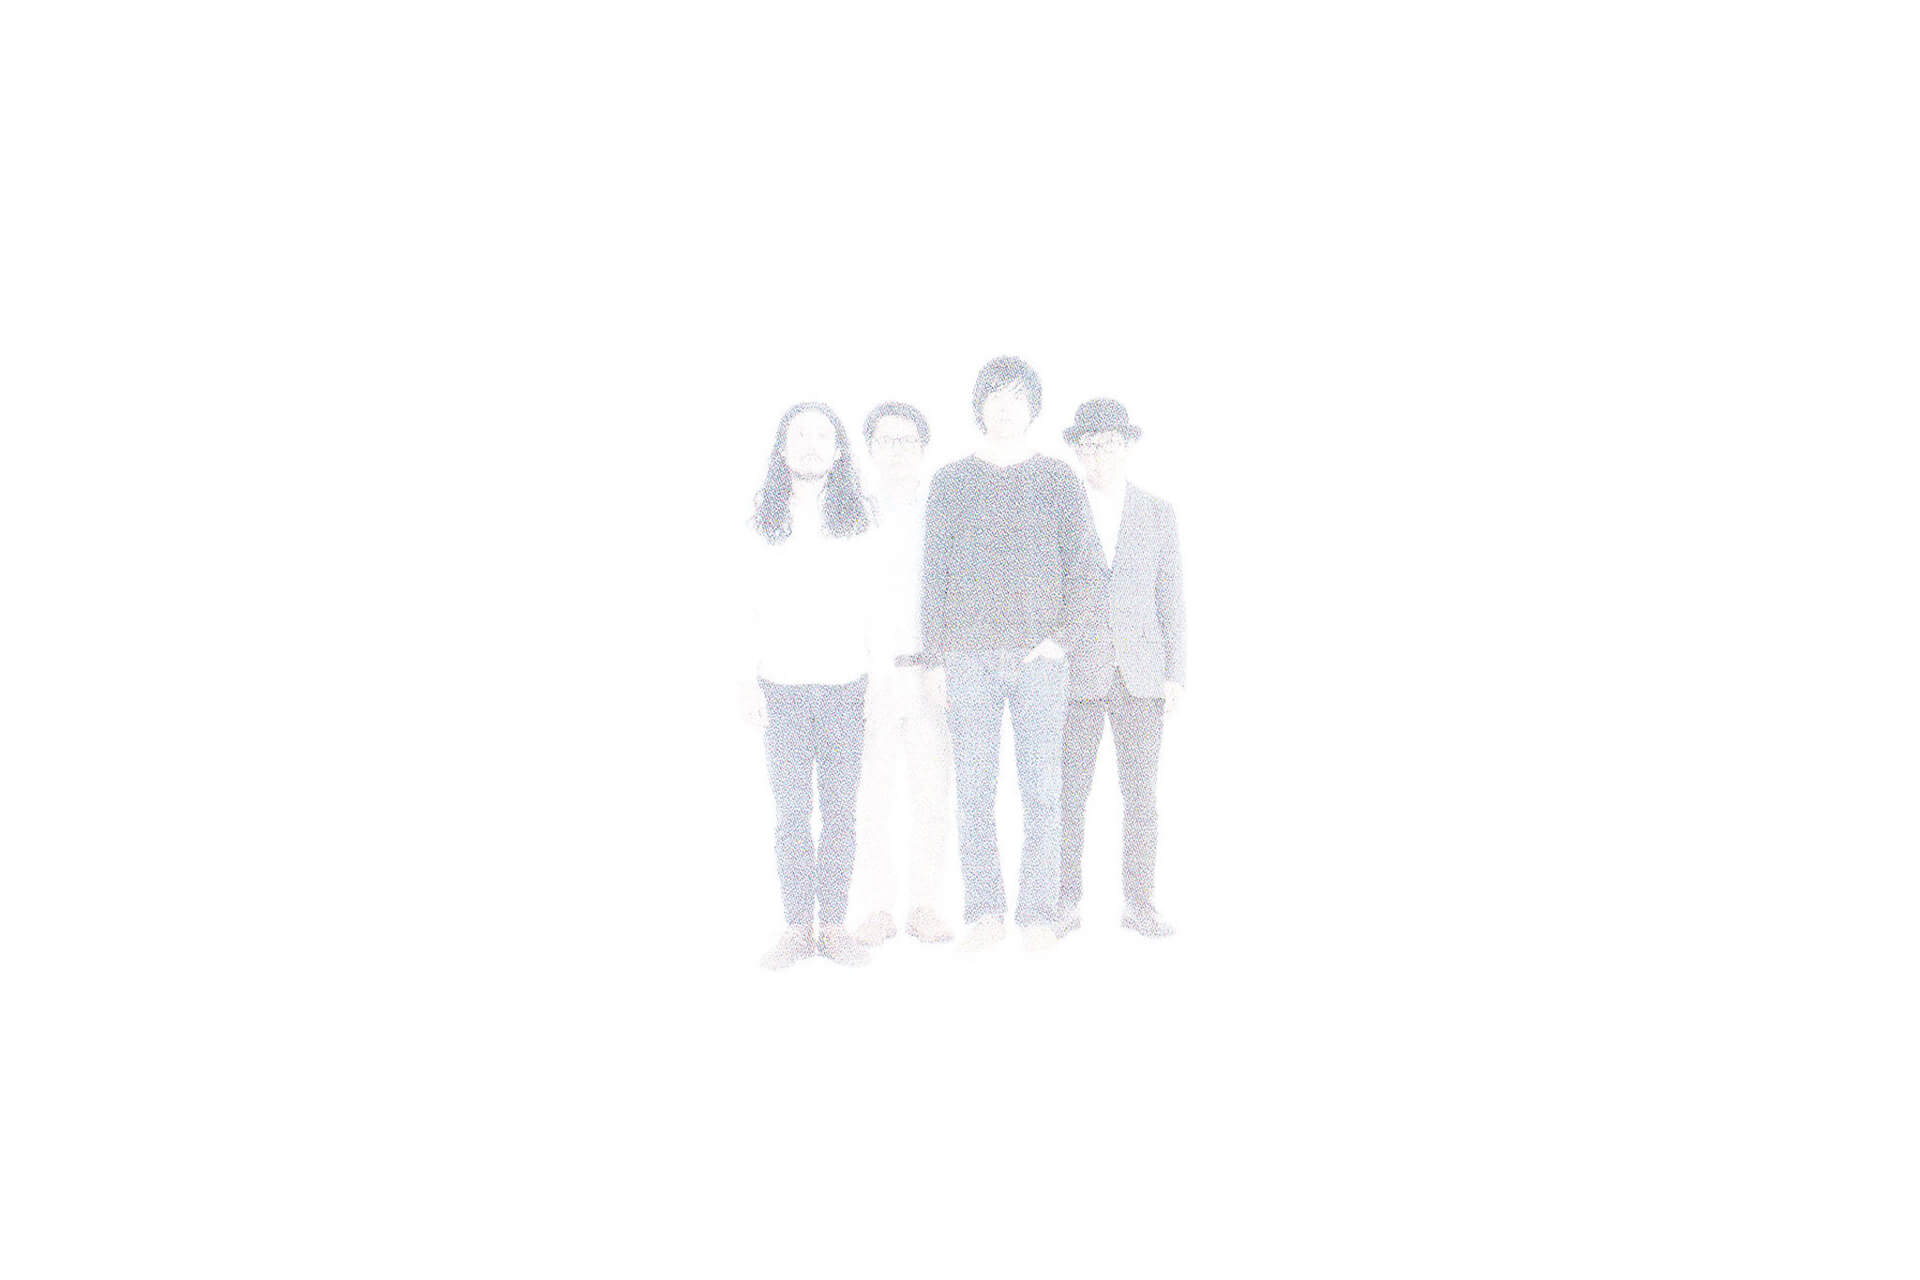 OGRE YOU ASSHOLEが毎年恒例となるLIQUIDROOMのワンマンライブを悪魔の沼を迎えて開催 会場限定販売のライブアレンジアルバム『workshop 2』が明日から配信開始、『新しい人』アナログ盤が2020年1月に発売 music191210-ogreyouasshole